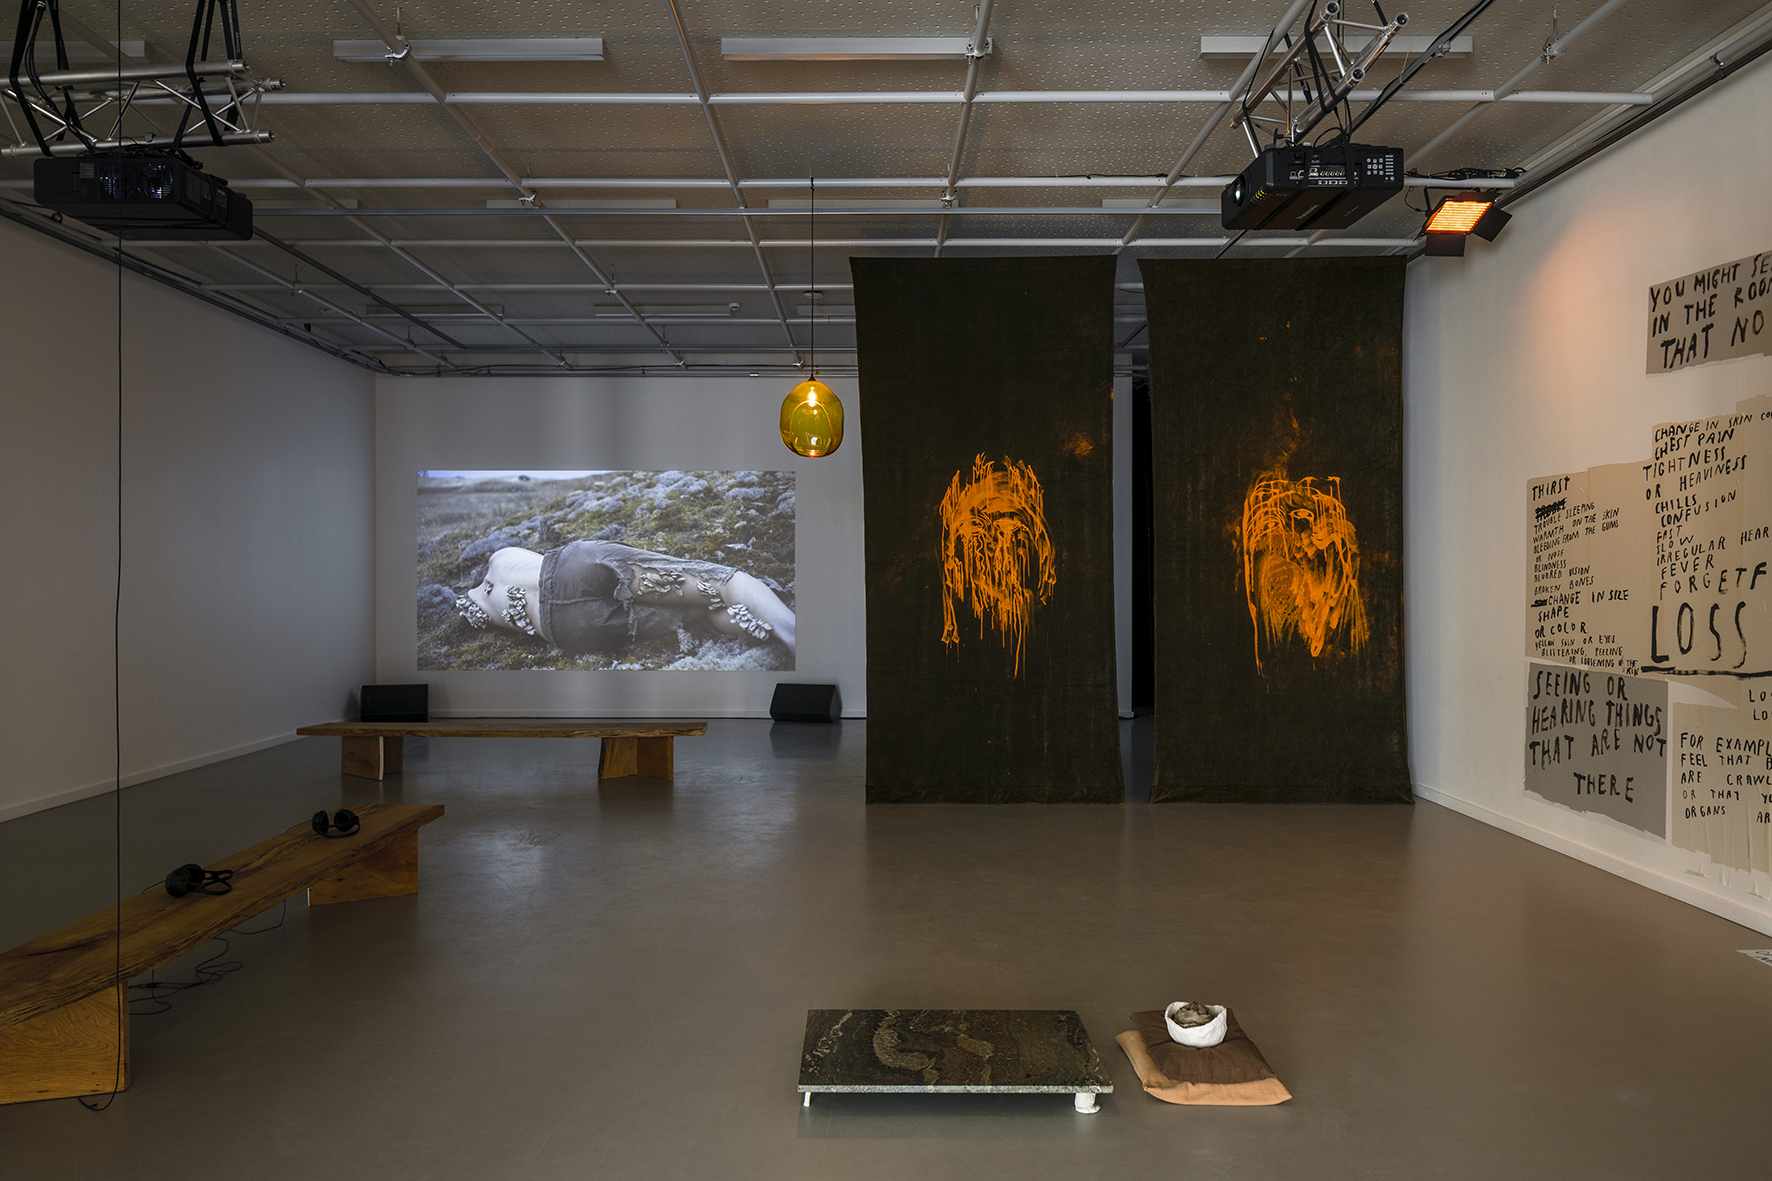 Spectral Forest_Nida Art Colony_4Cs_Curator_Rado_Istok_Photo_Ansis_Starks_5_LOW